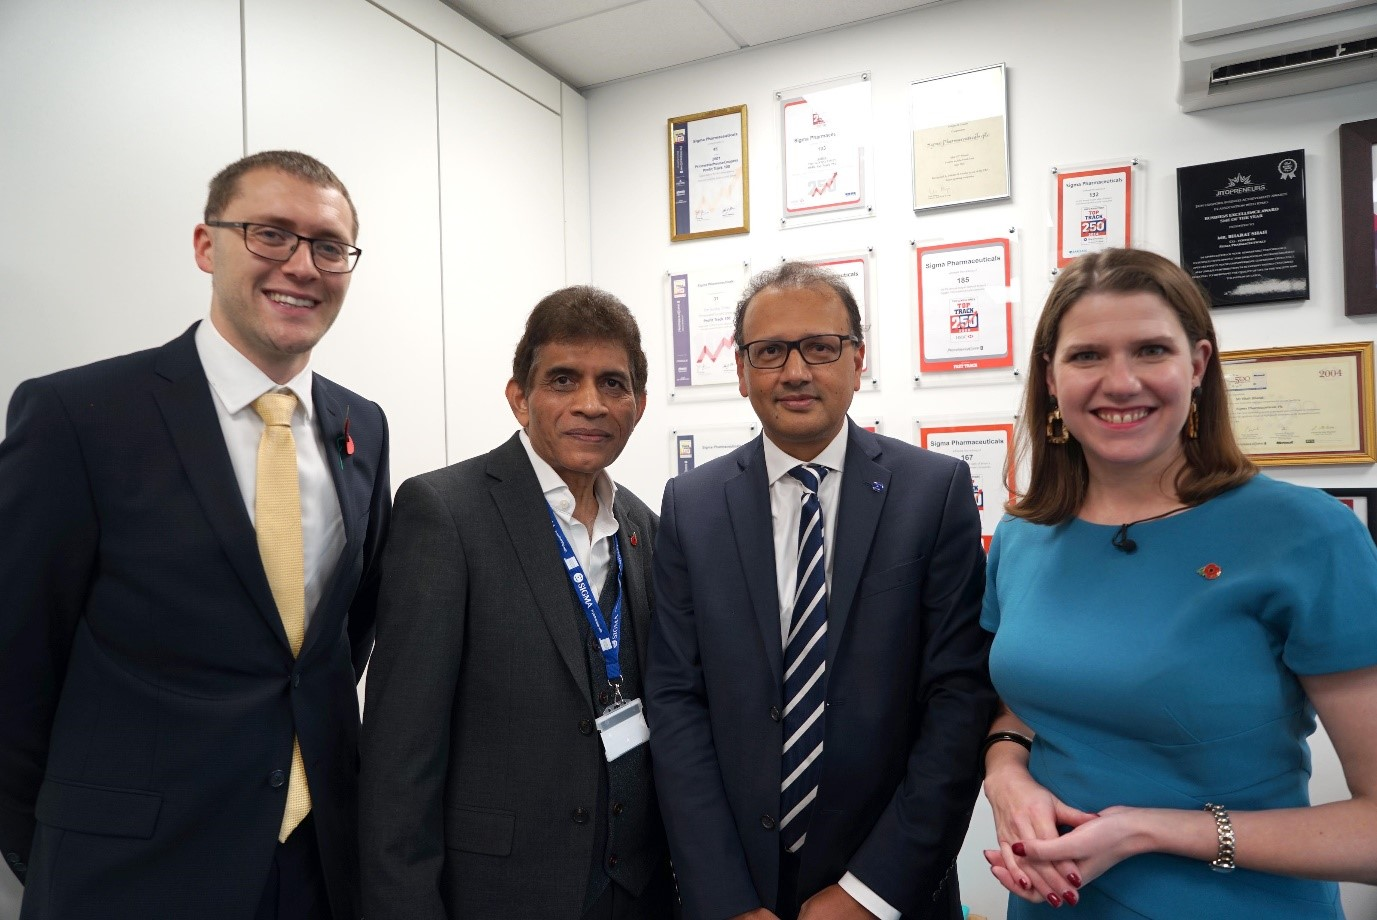 Liberal Democrat leader Jo Swinson MP visits Sigma Pharmaceuticals Plc